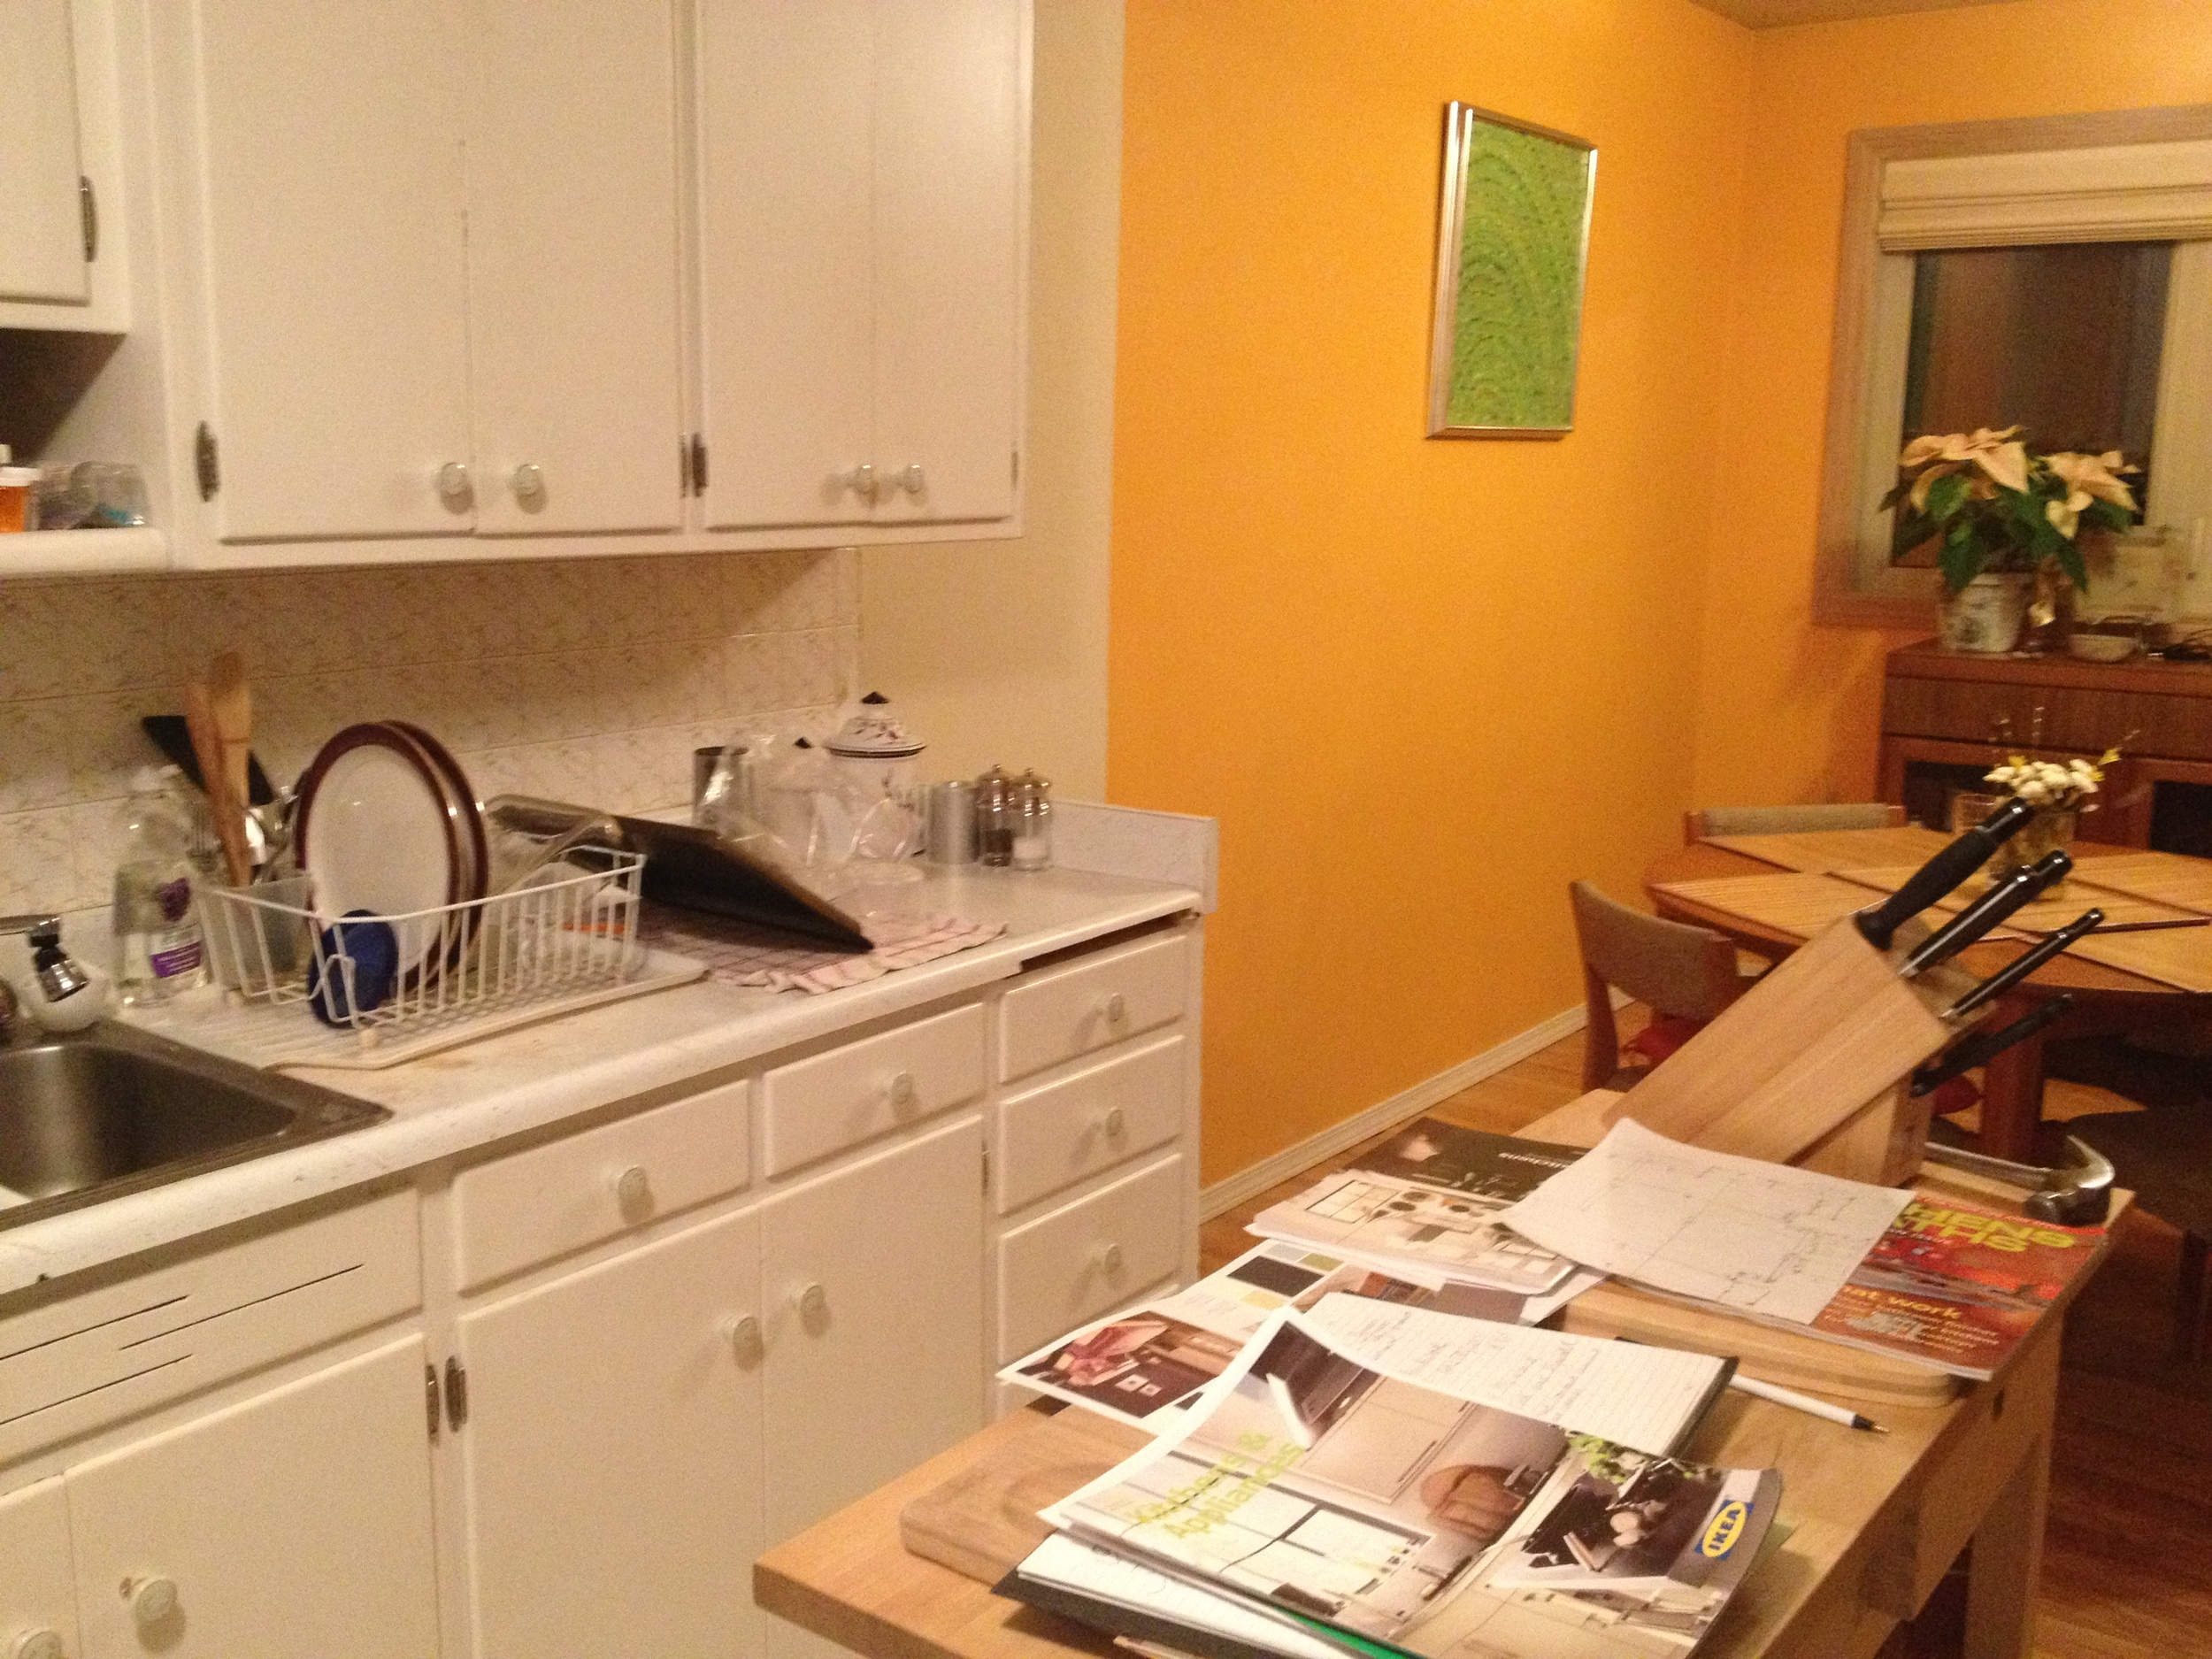 Westmount Kitchen Renovation Before